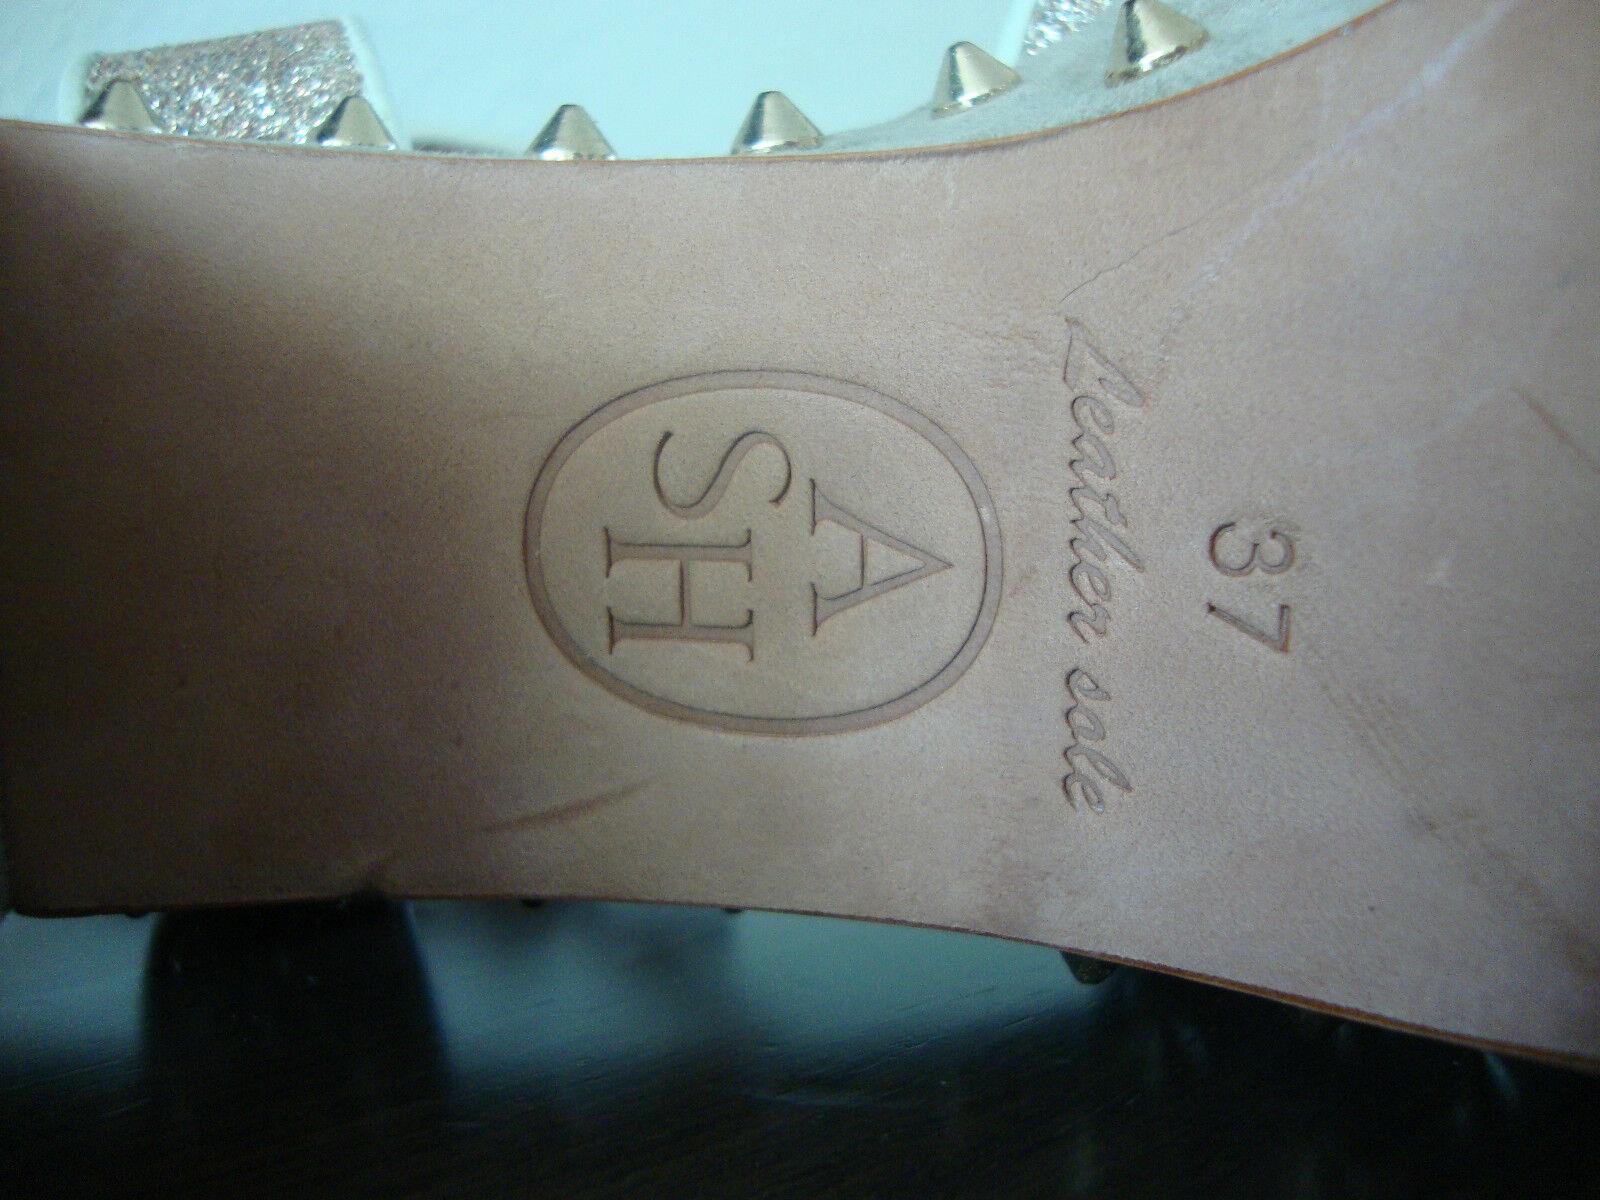 ASH CAPRICE Sandale Leder Schuhe Glitzer Damen Sandalette Sandalen Glitzer Schuhe Gold Gr.37 NEU fcb4e8